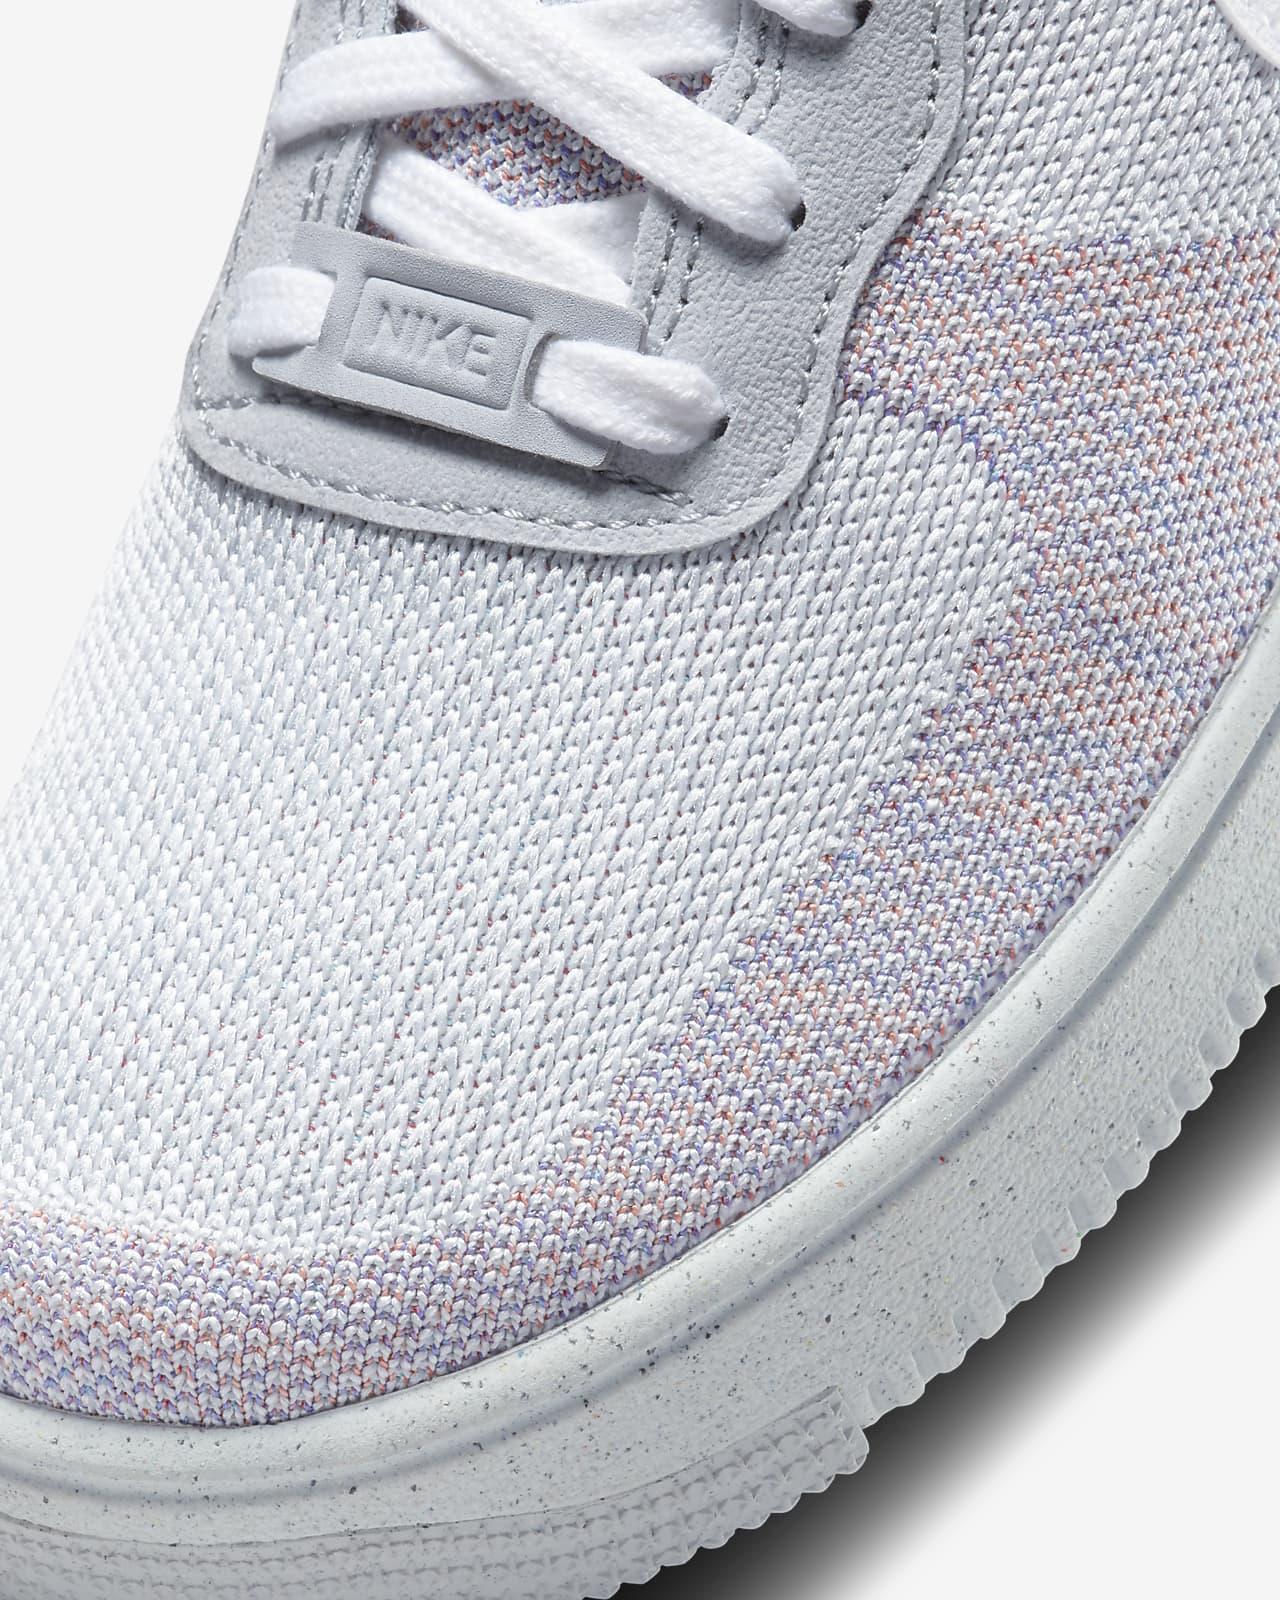 Scarpa Nike Air Force 1 Crater Flyknit - Ragazzi